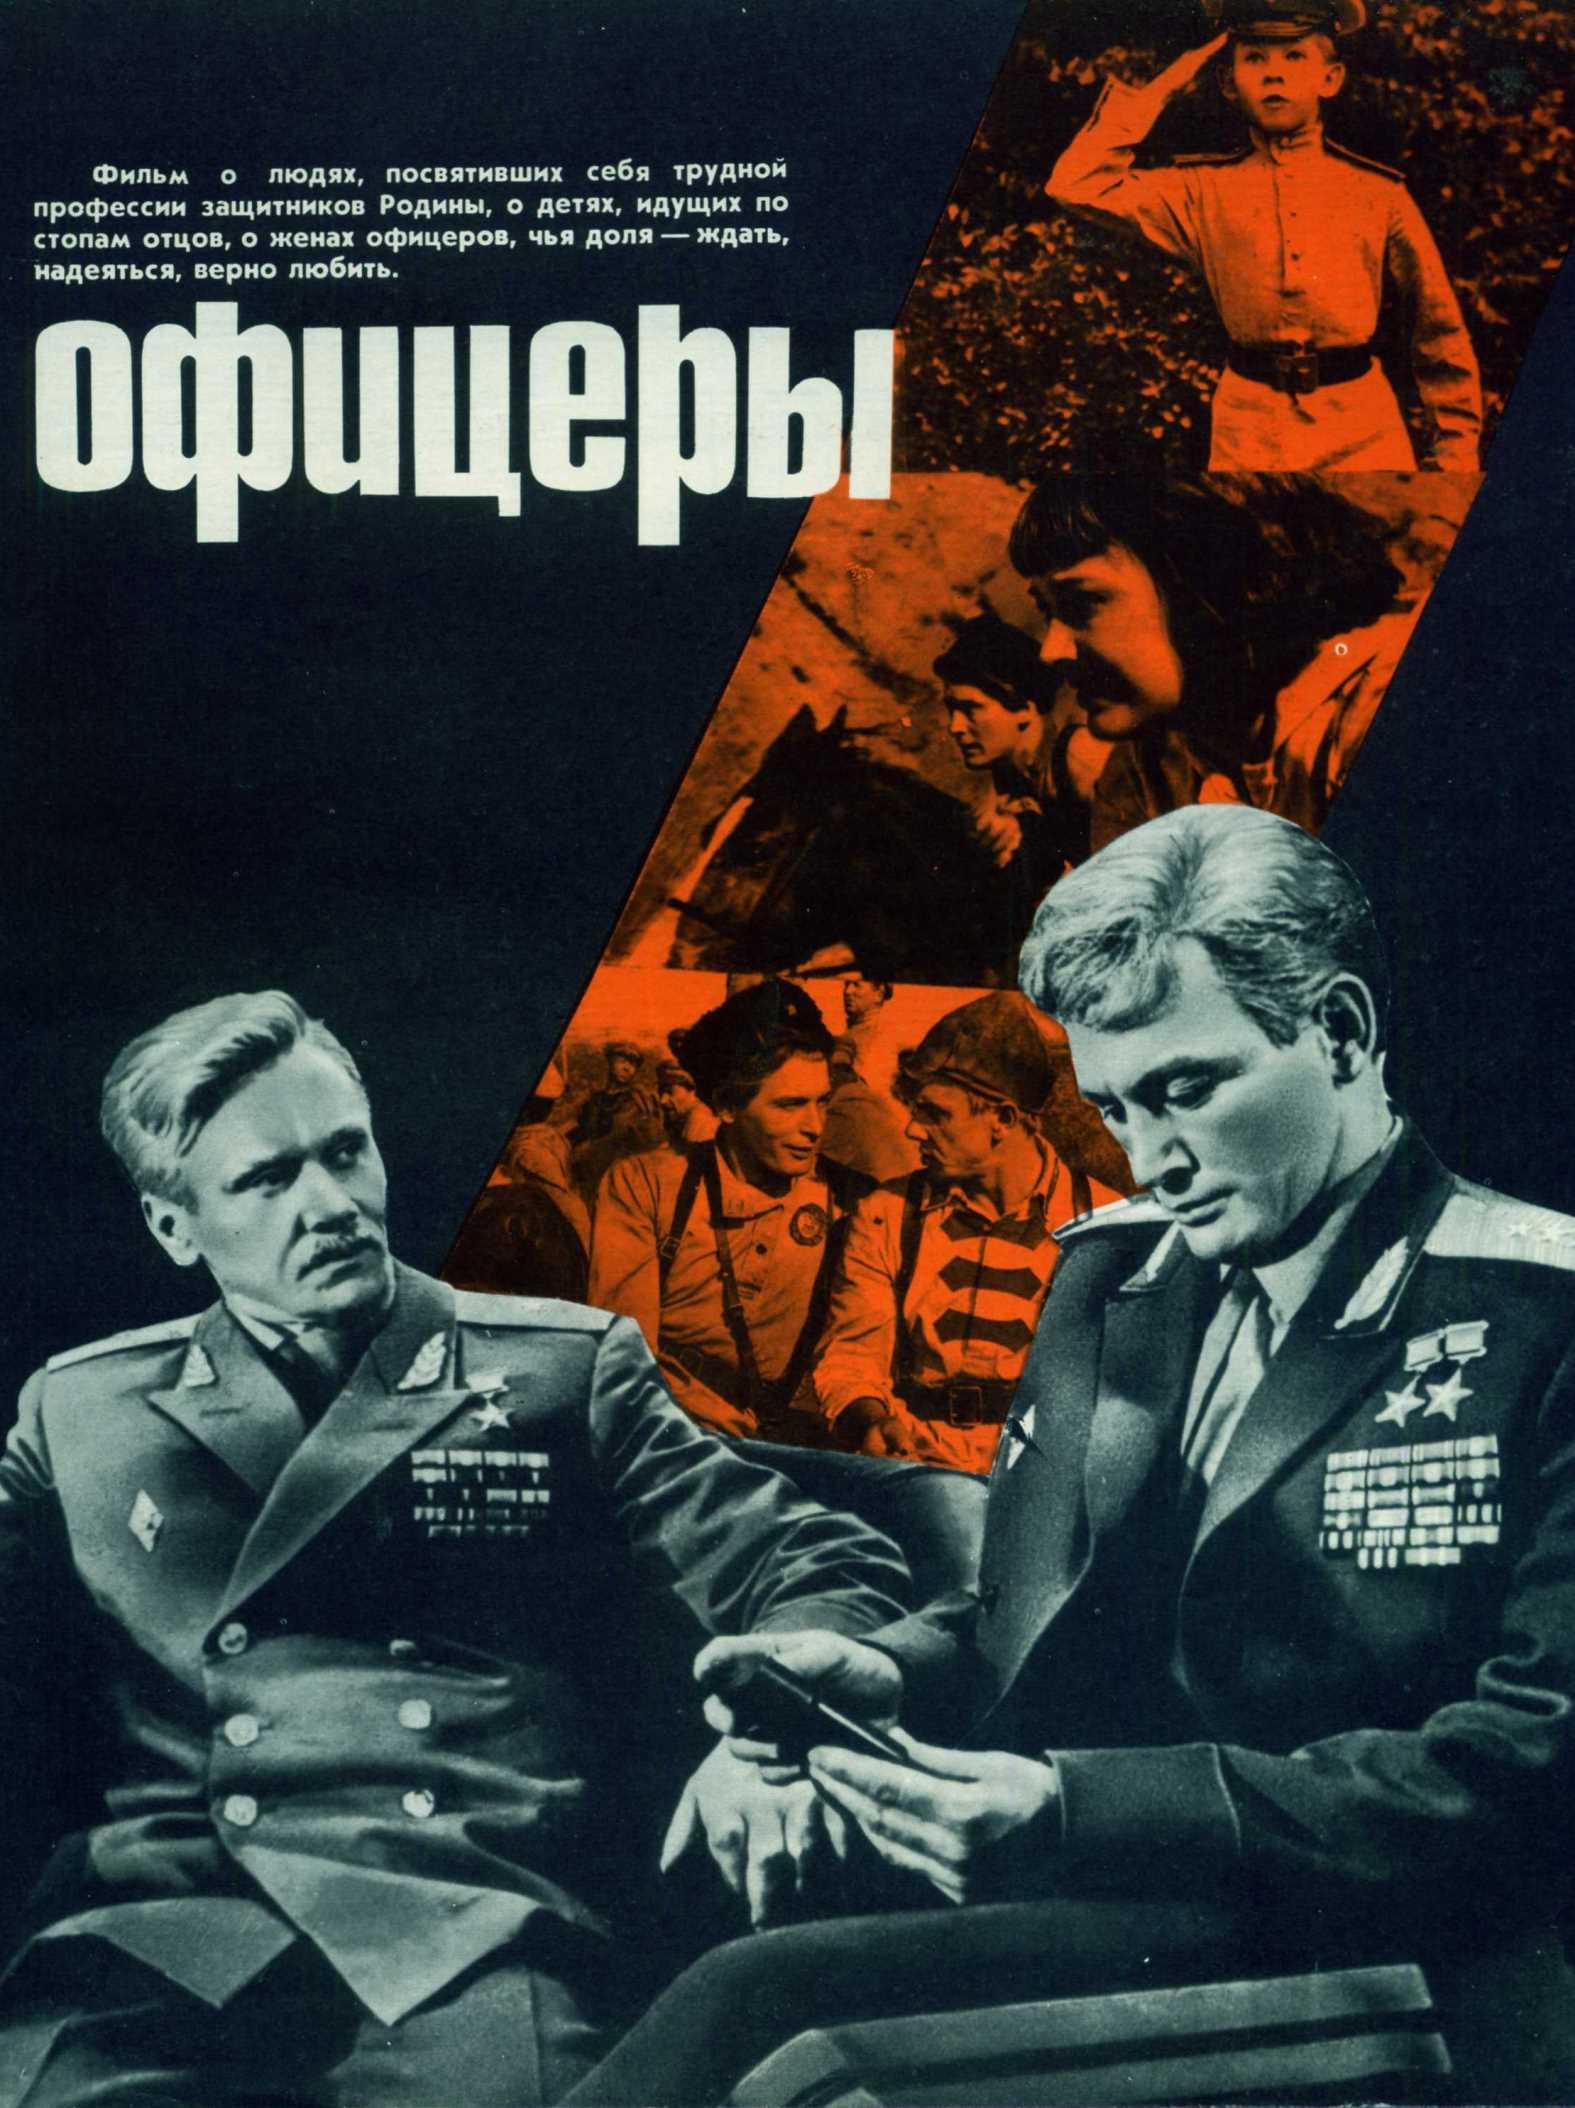 Презентация к фильму офицеры